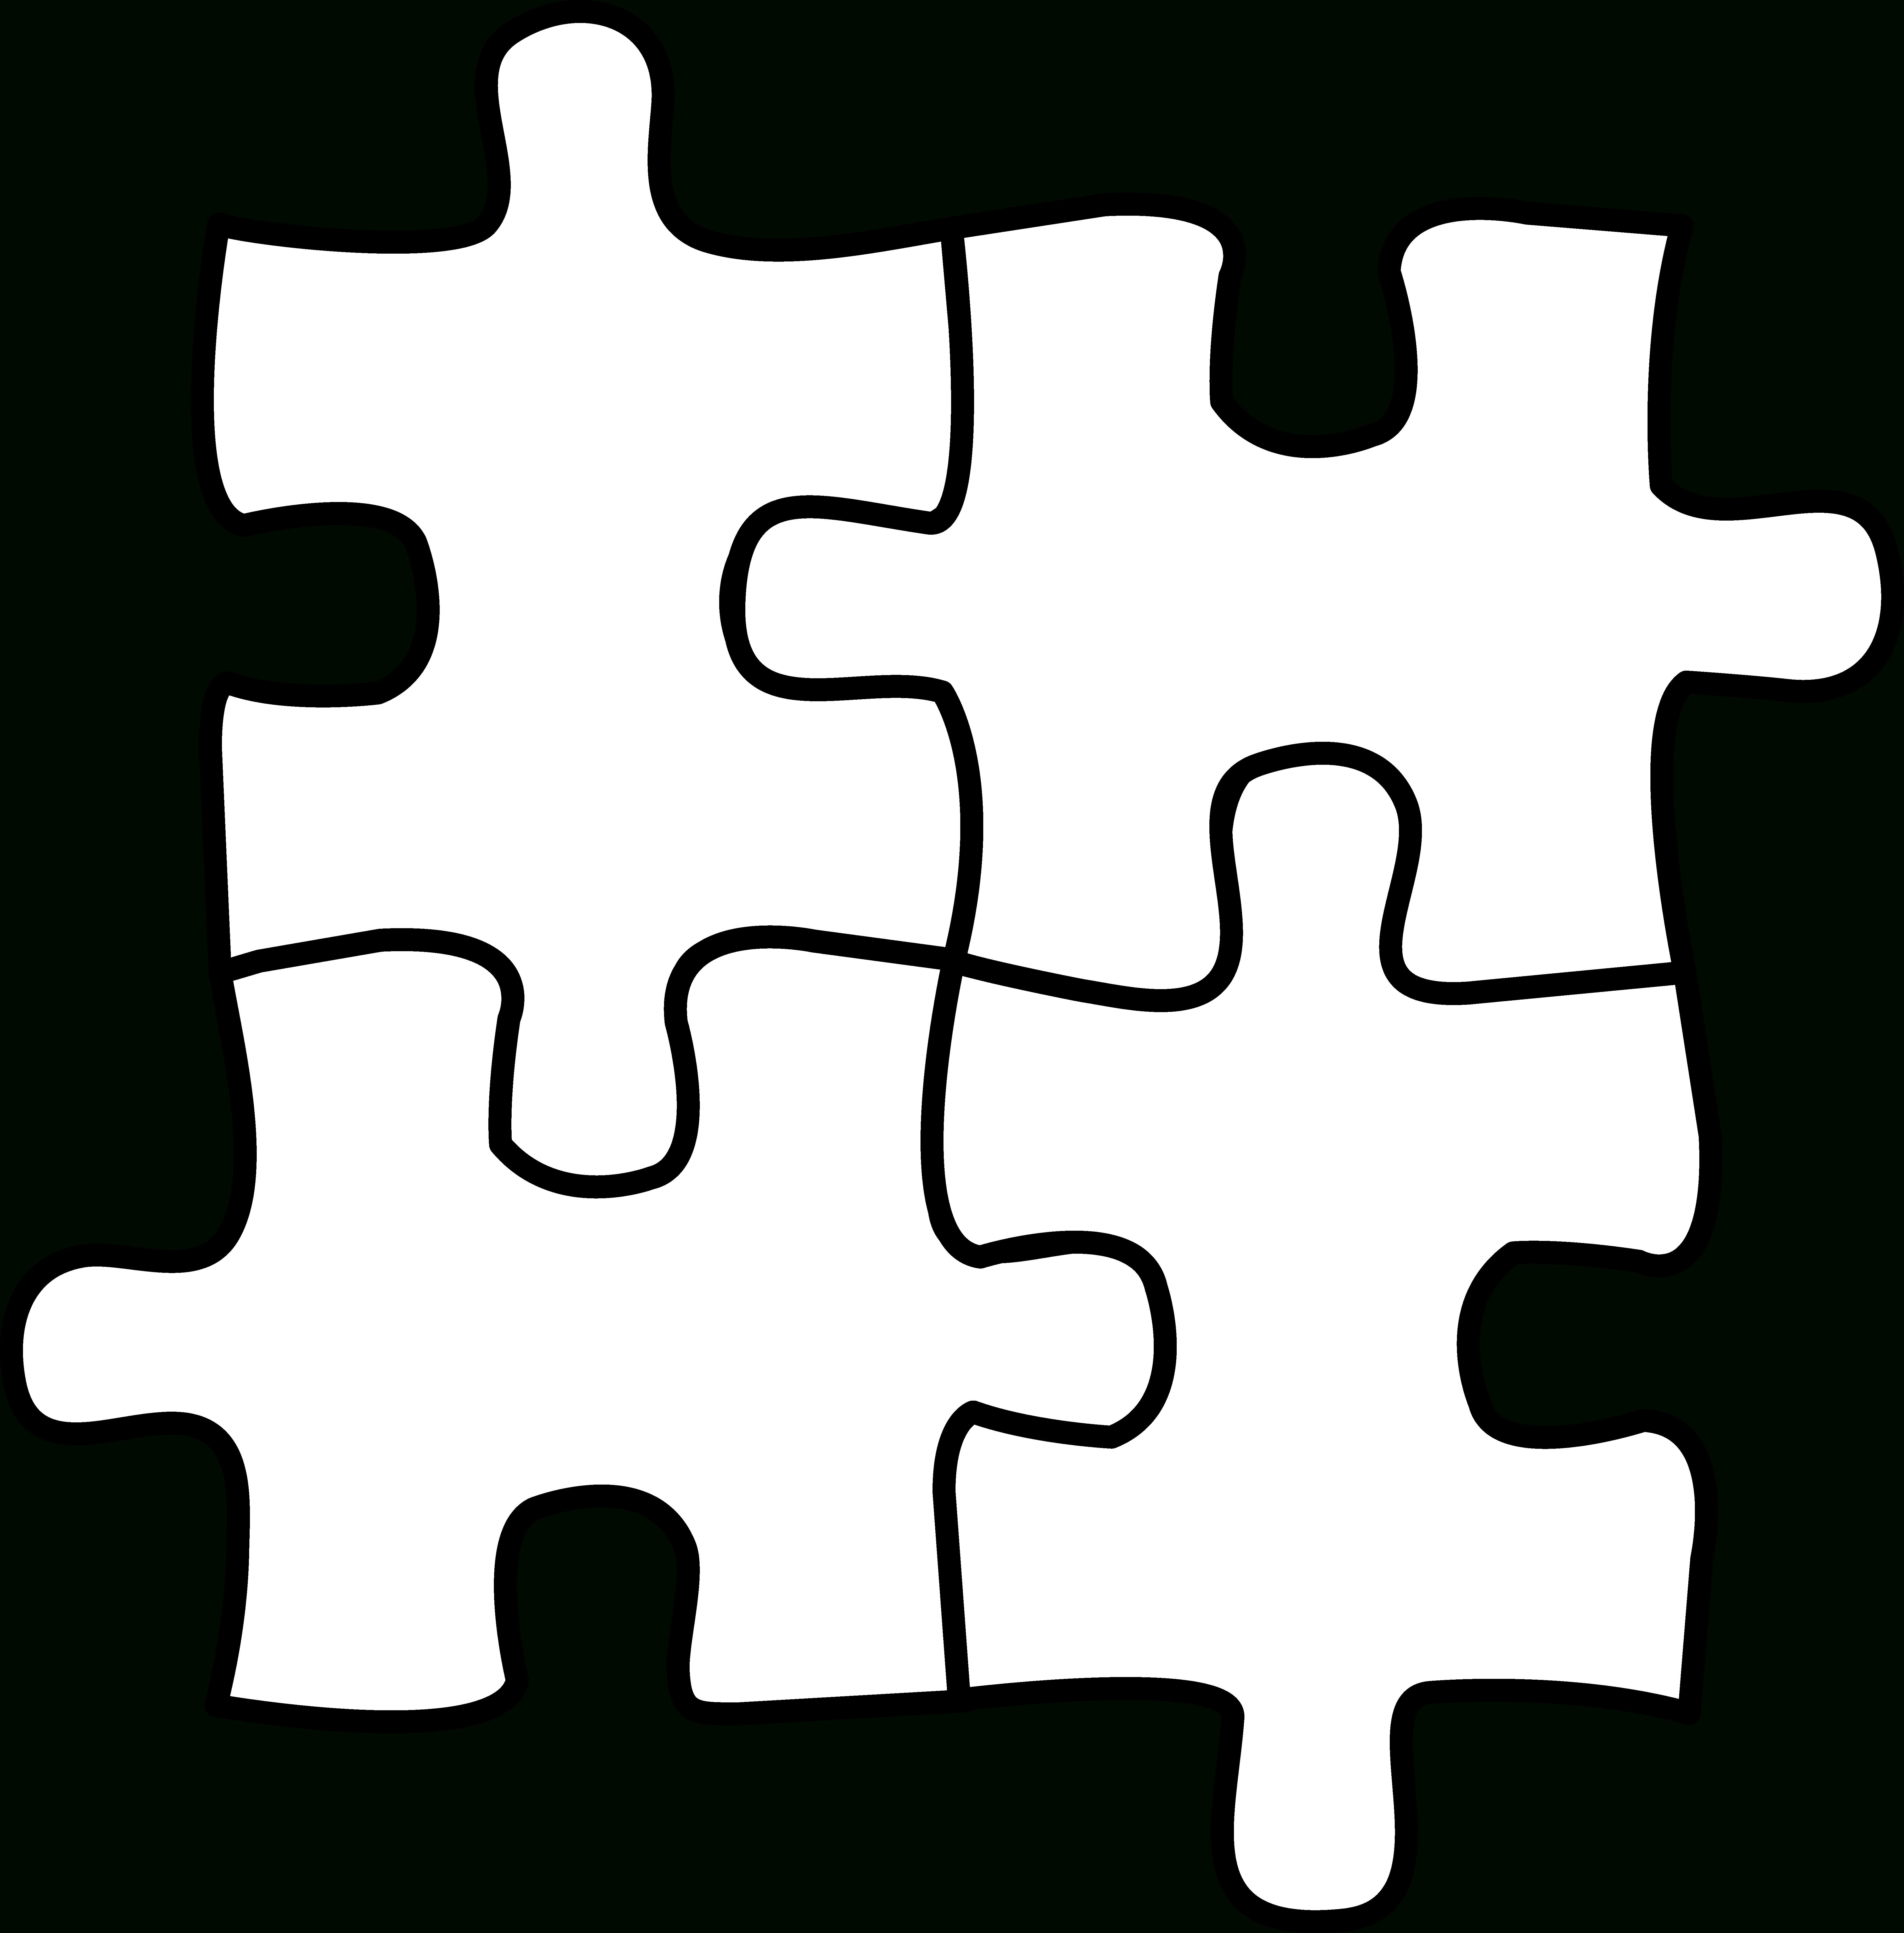 Autism Puzzle Piece Coloring Page - Coloring Home - Printable Colored Puzzle Pieces